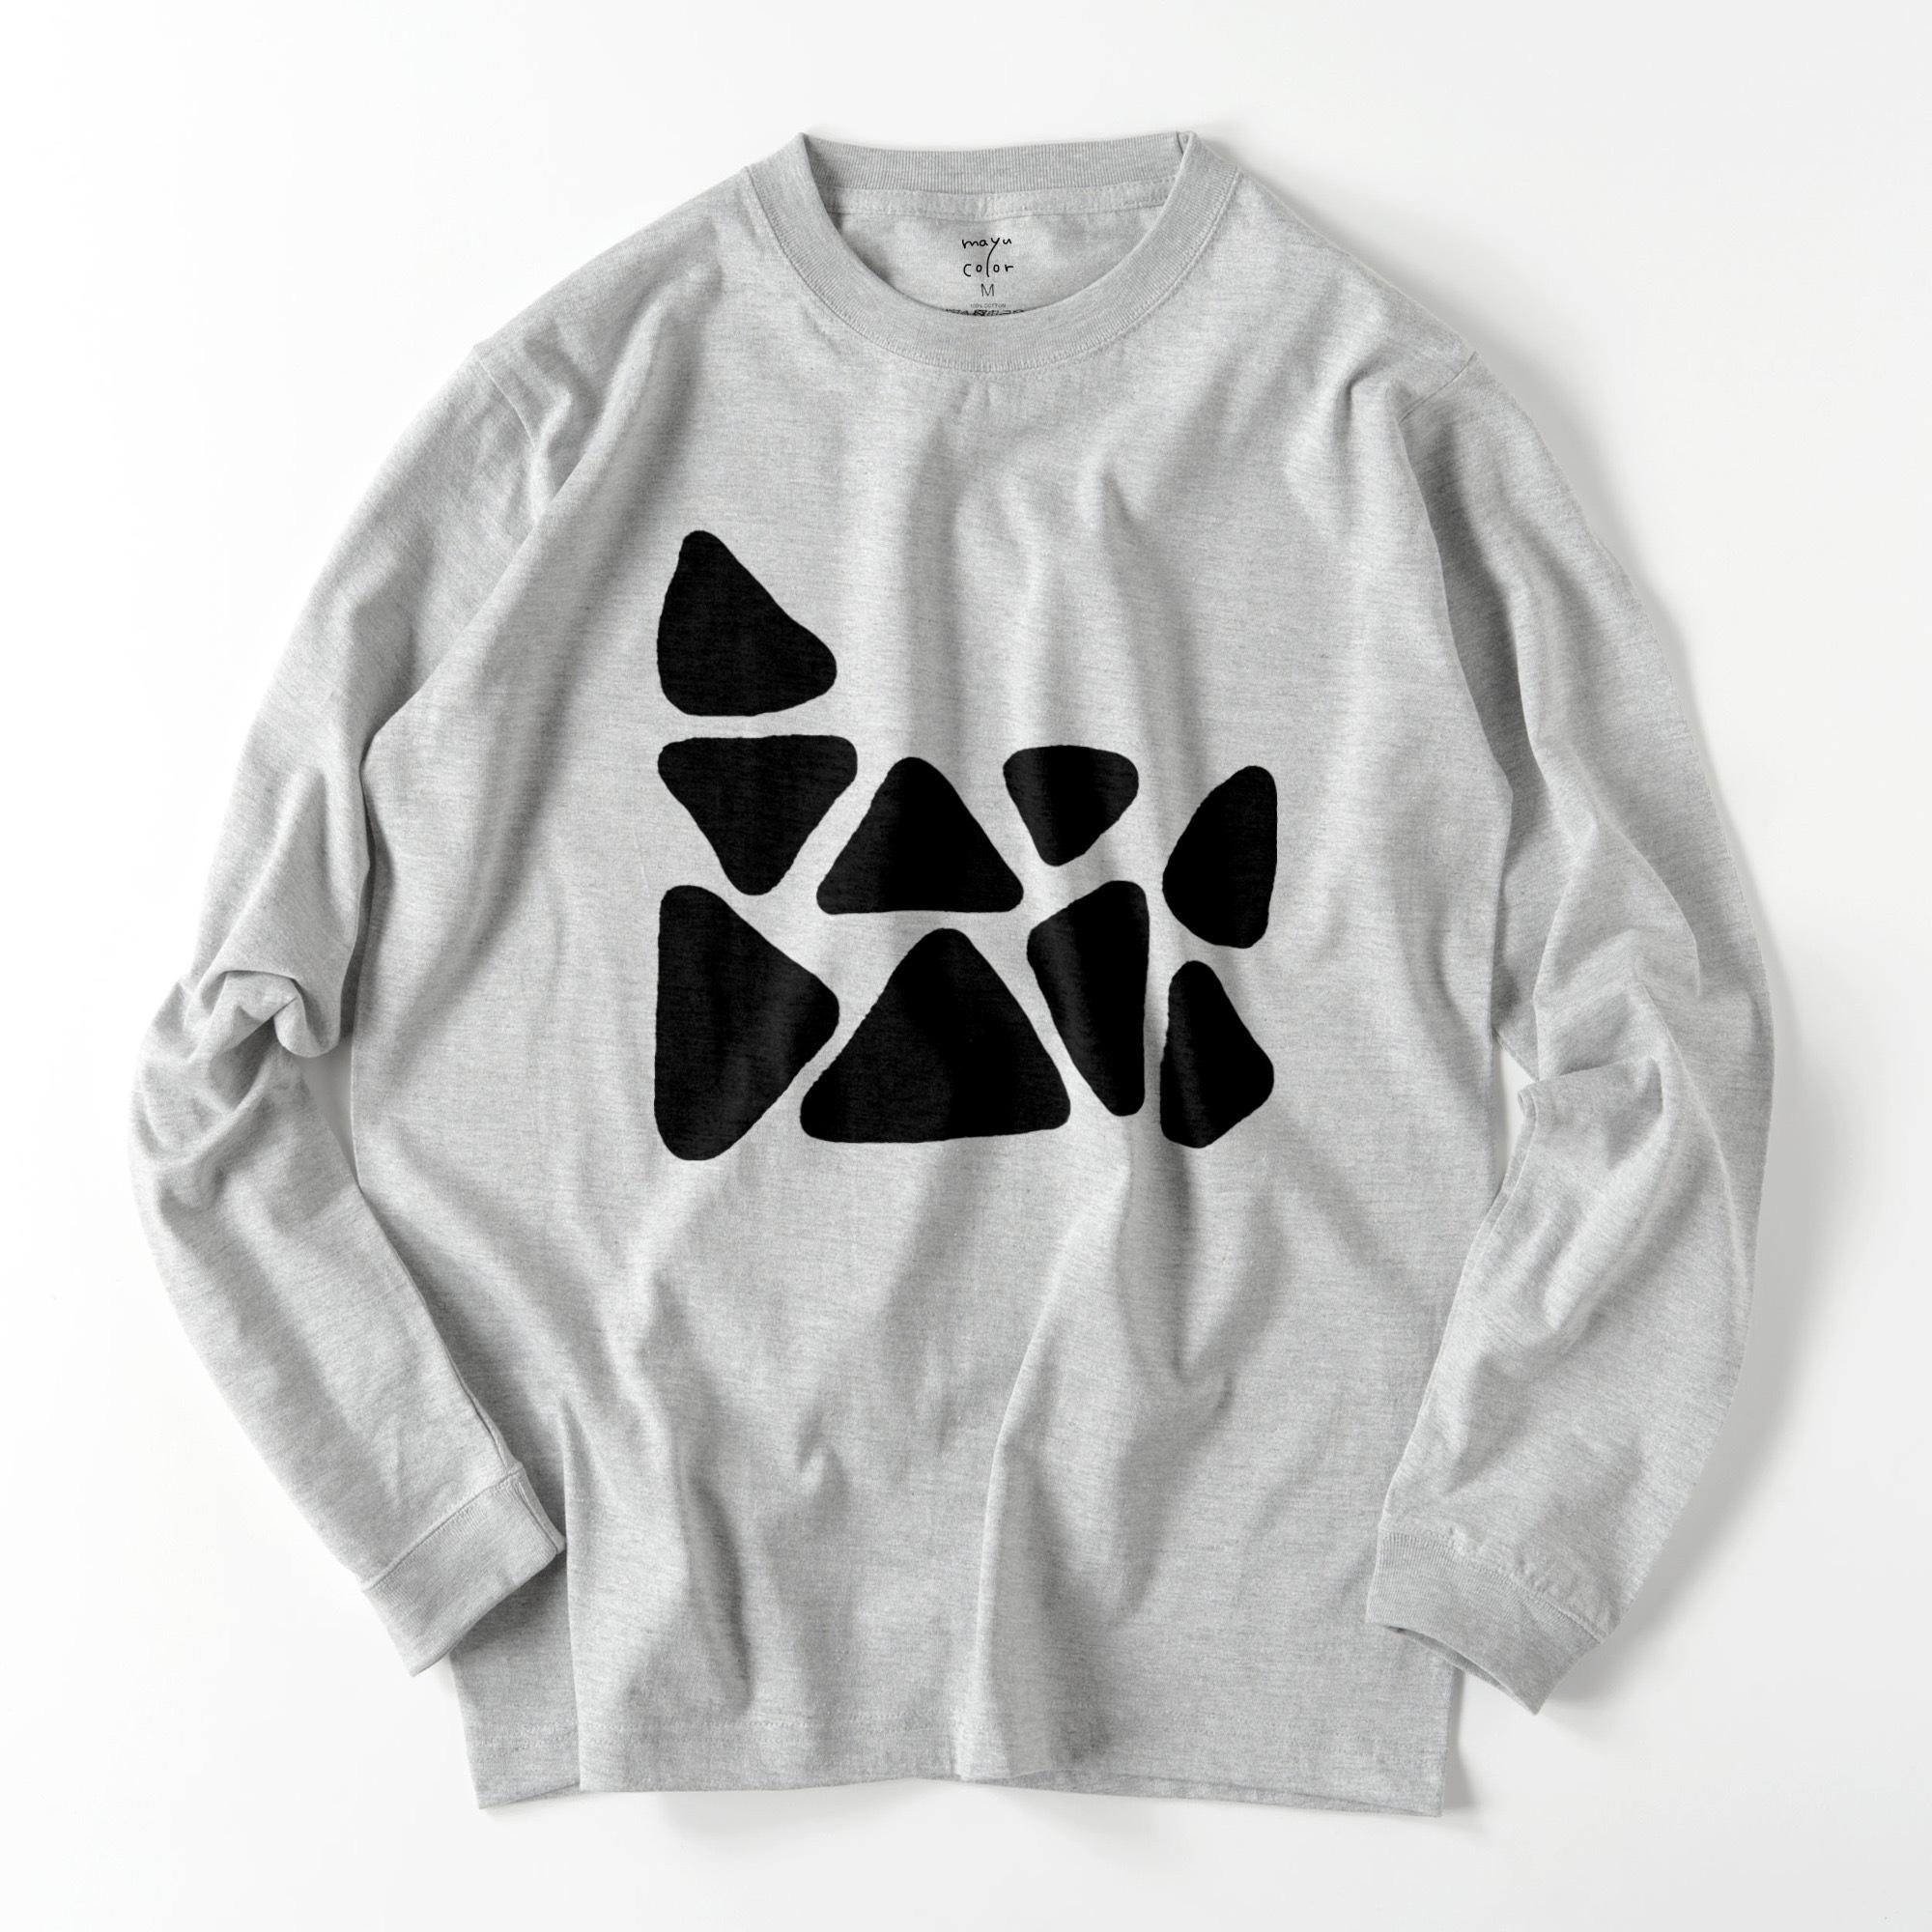 onigiri/GRY/モノトーン【シンプルデザインTシャツ】©mayu_color.888